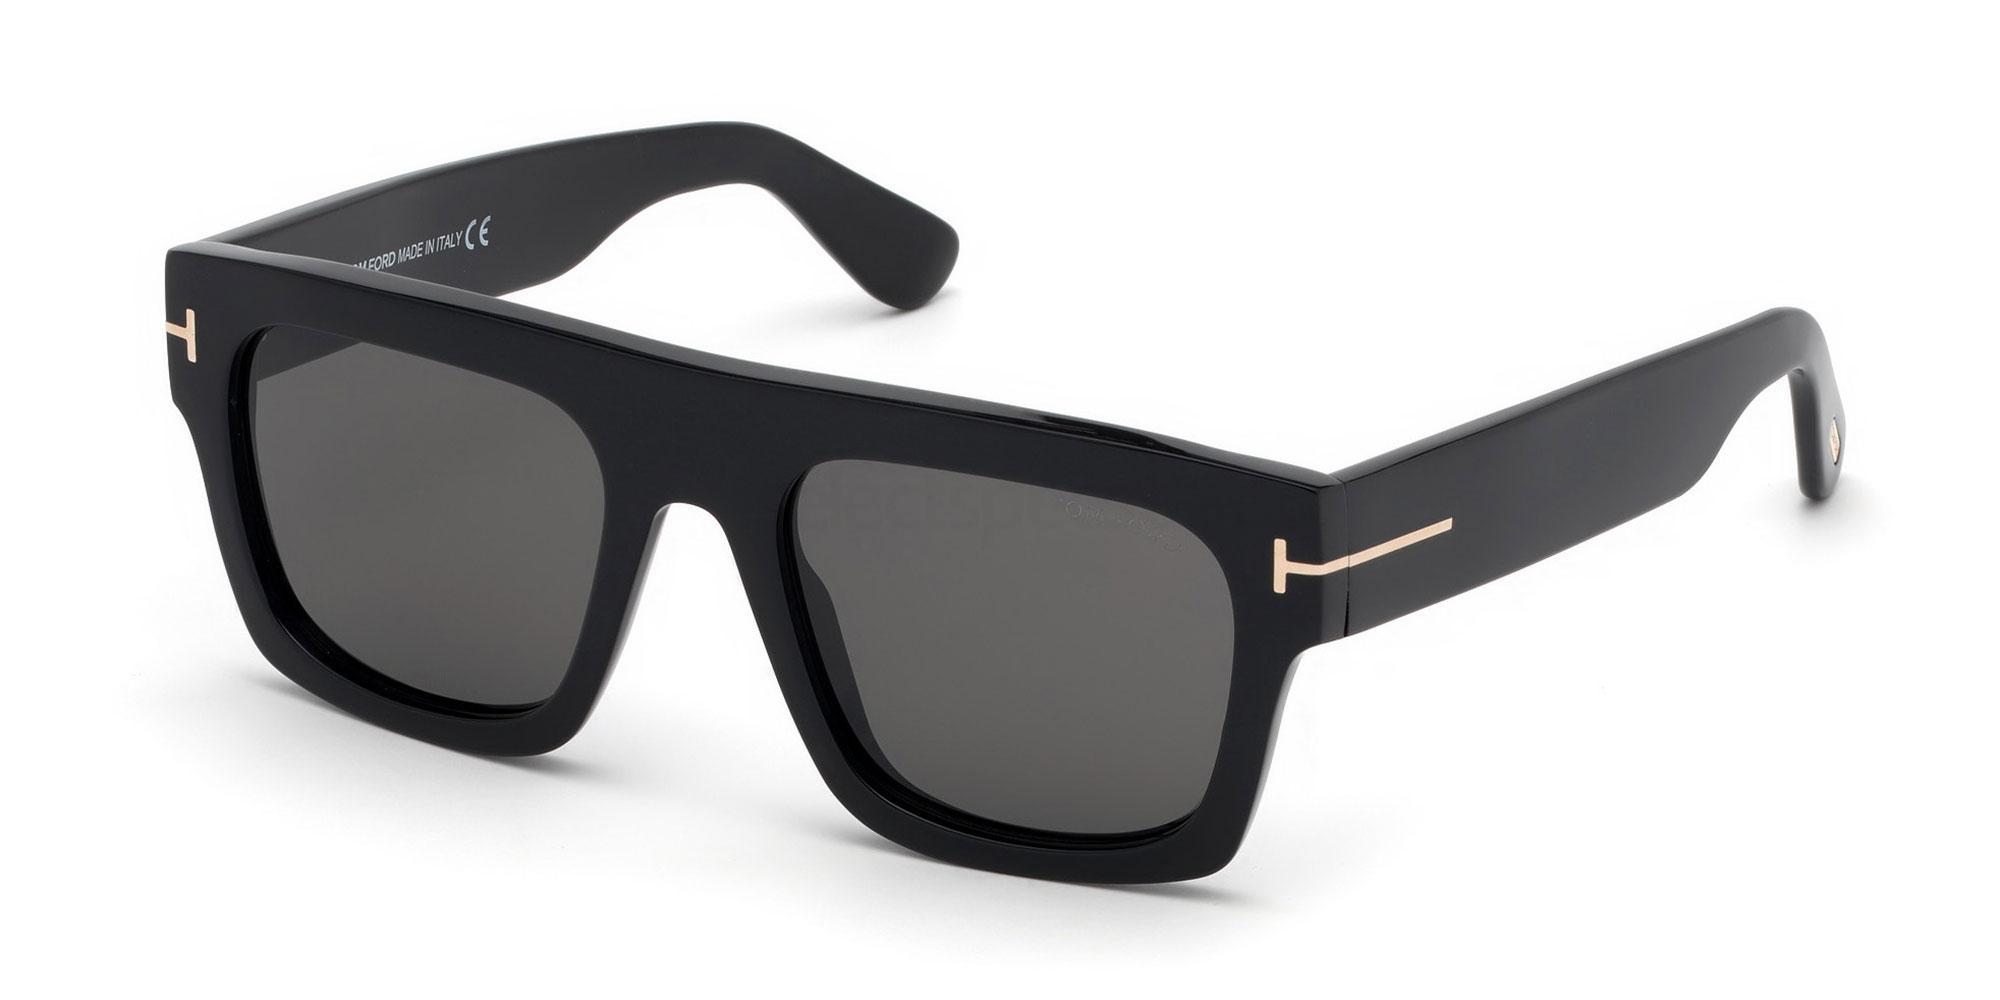 01A FT0711 Sunglasses, Tom Ford